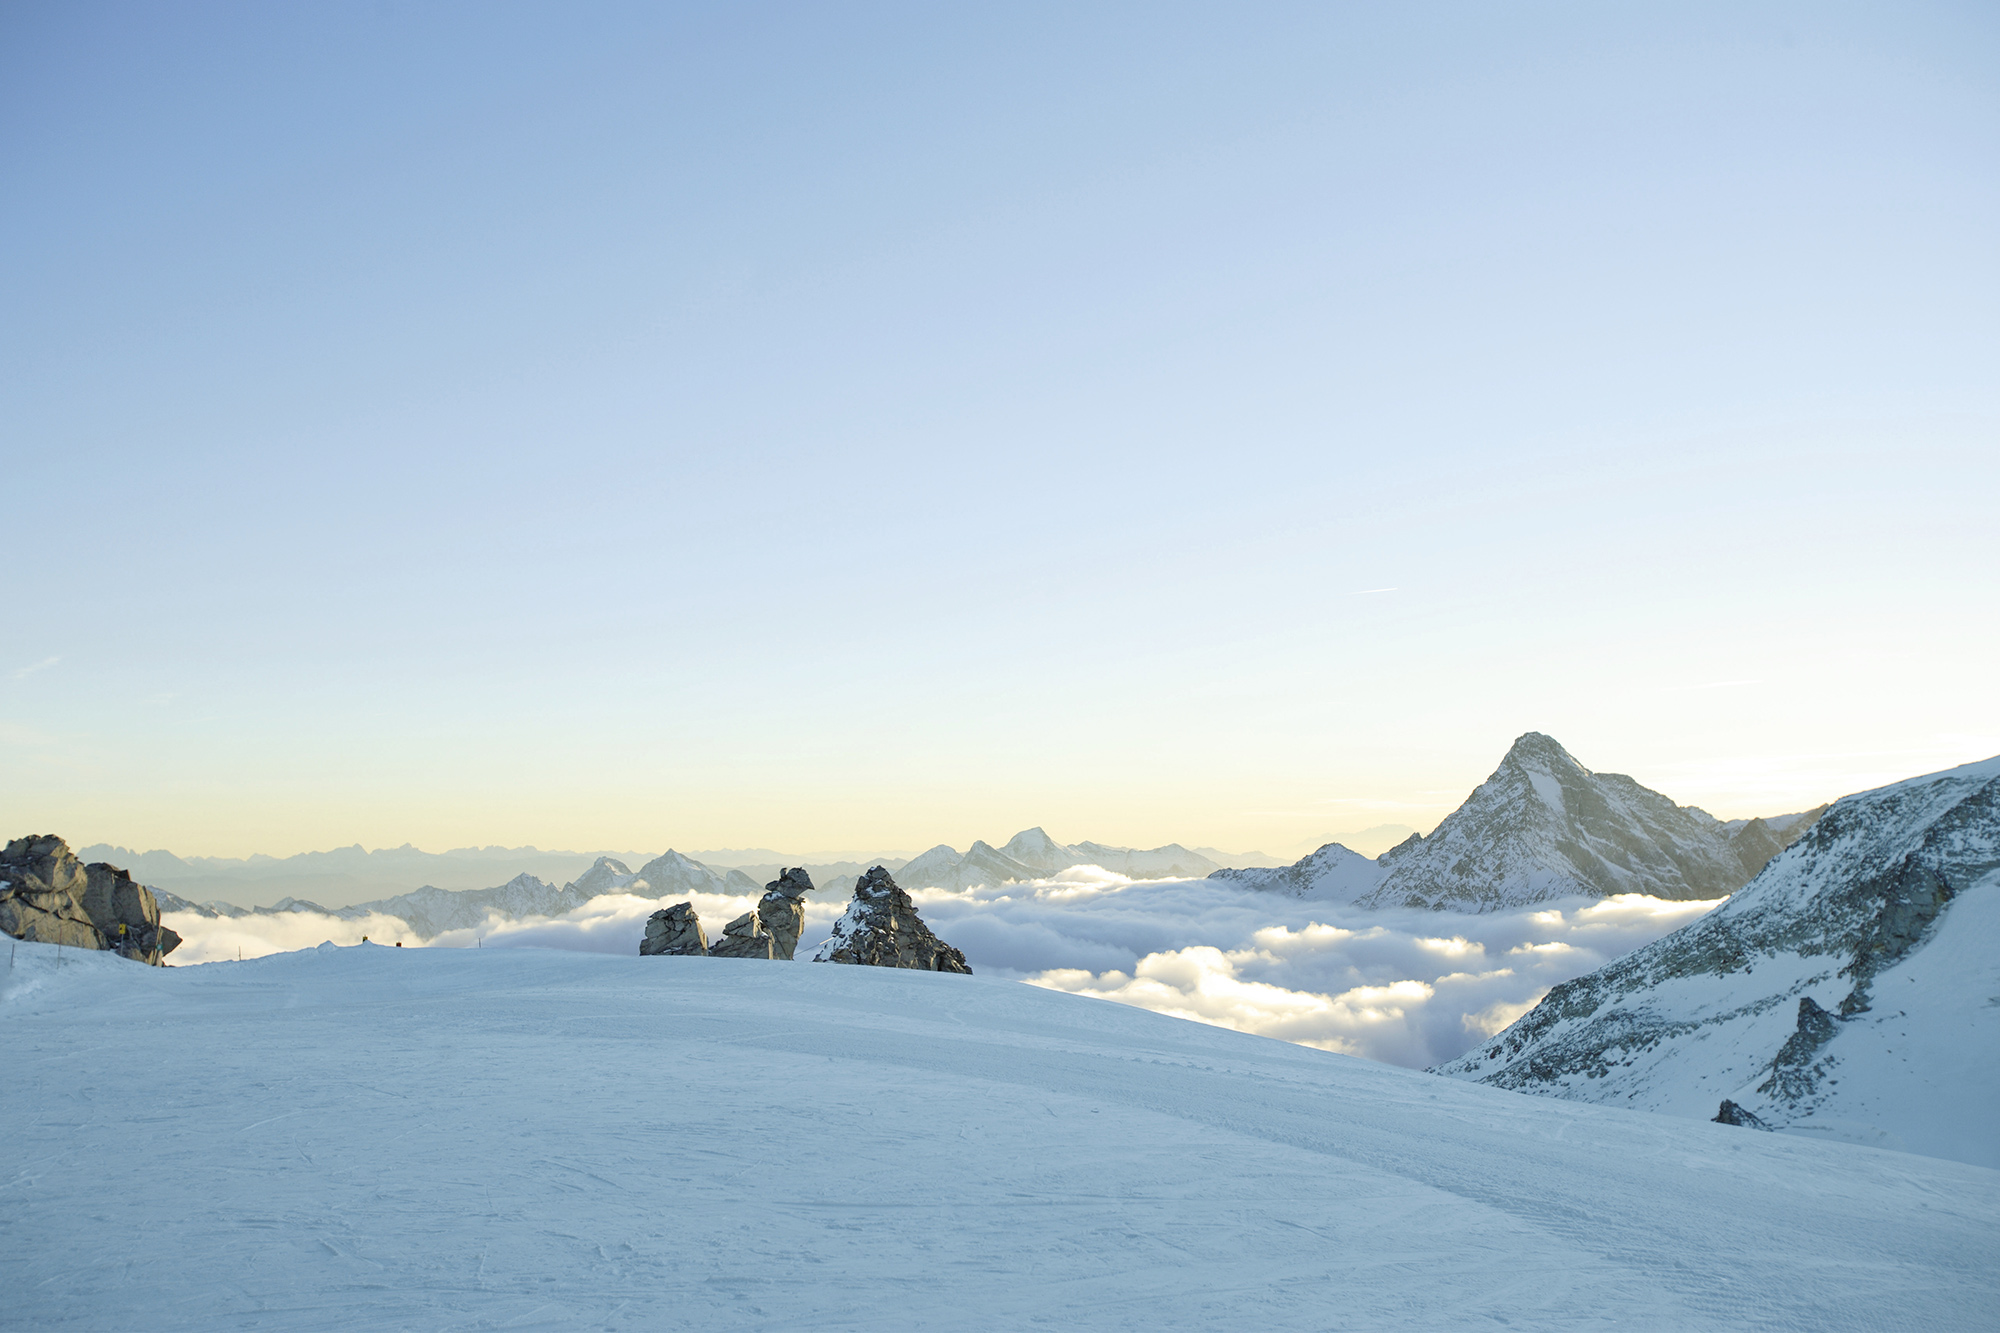 winterurlaub tirol top skigebiete in tirol erleben. Black Bedroom Furniture Sets. Home Design Ideas